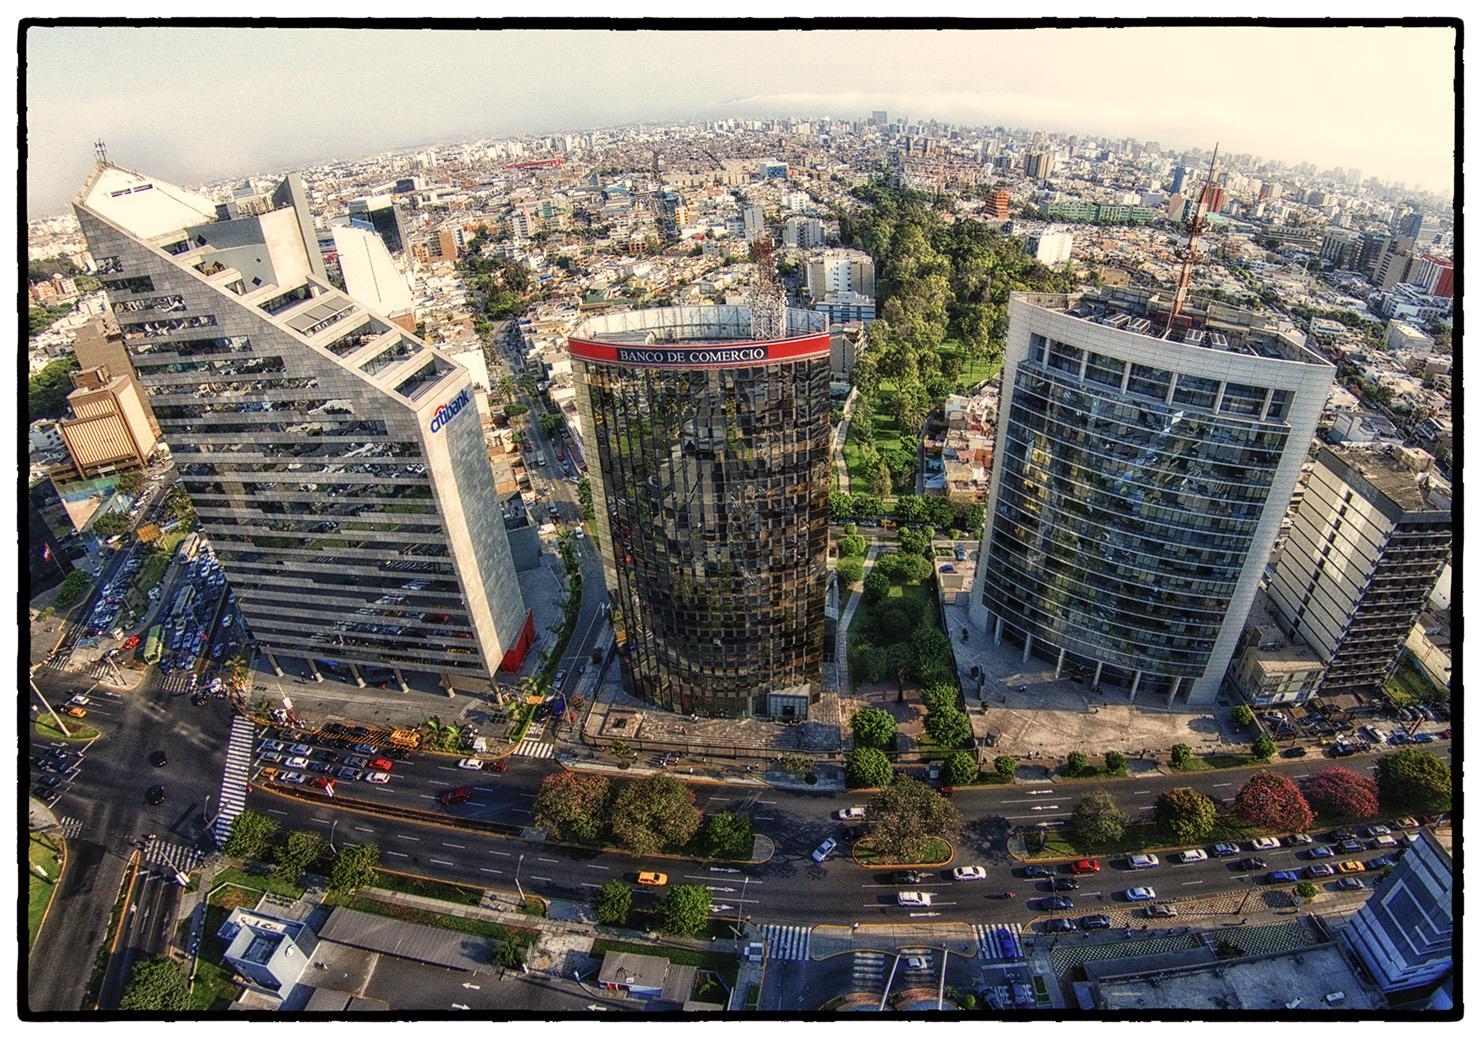 Panorama_sin_título1 copia.jpg